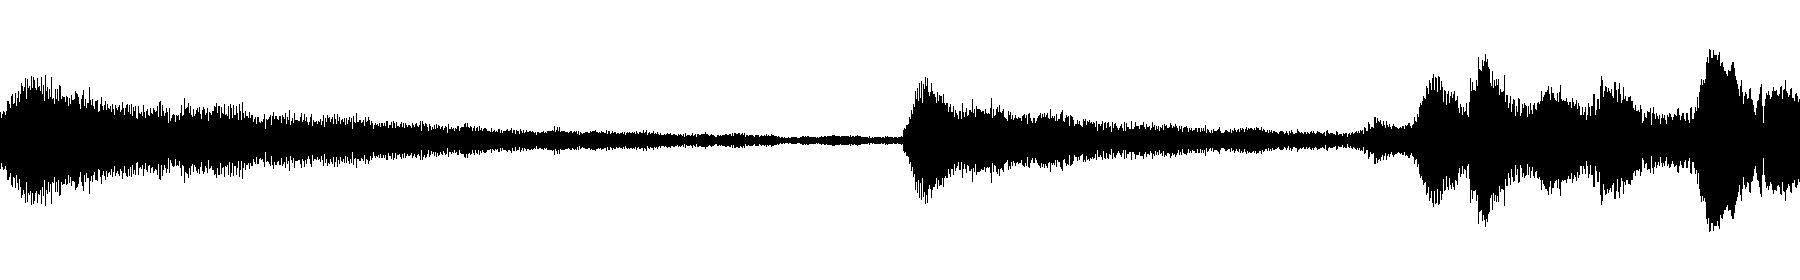 wafc dstpiano 140 reflective f 01